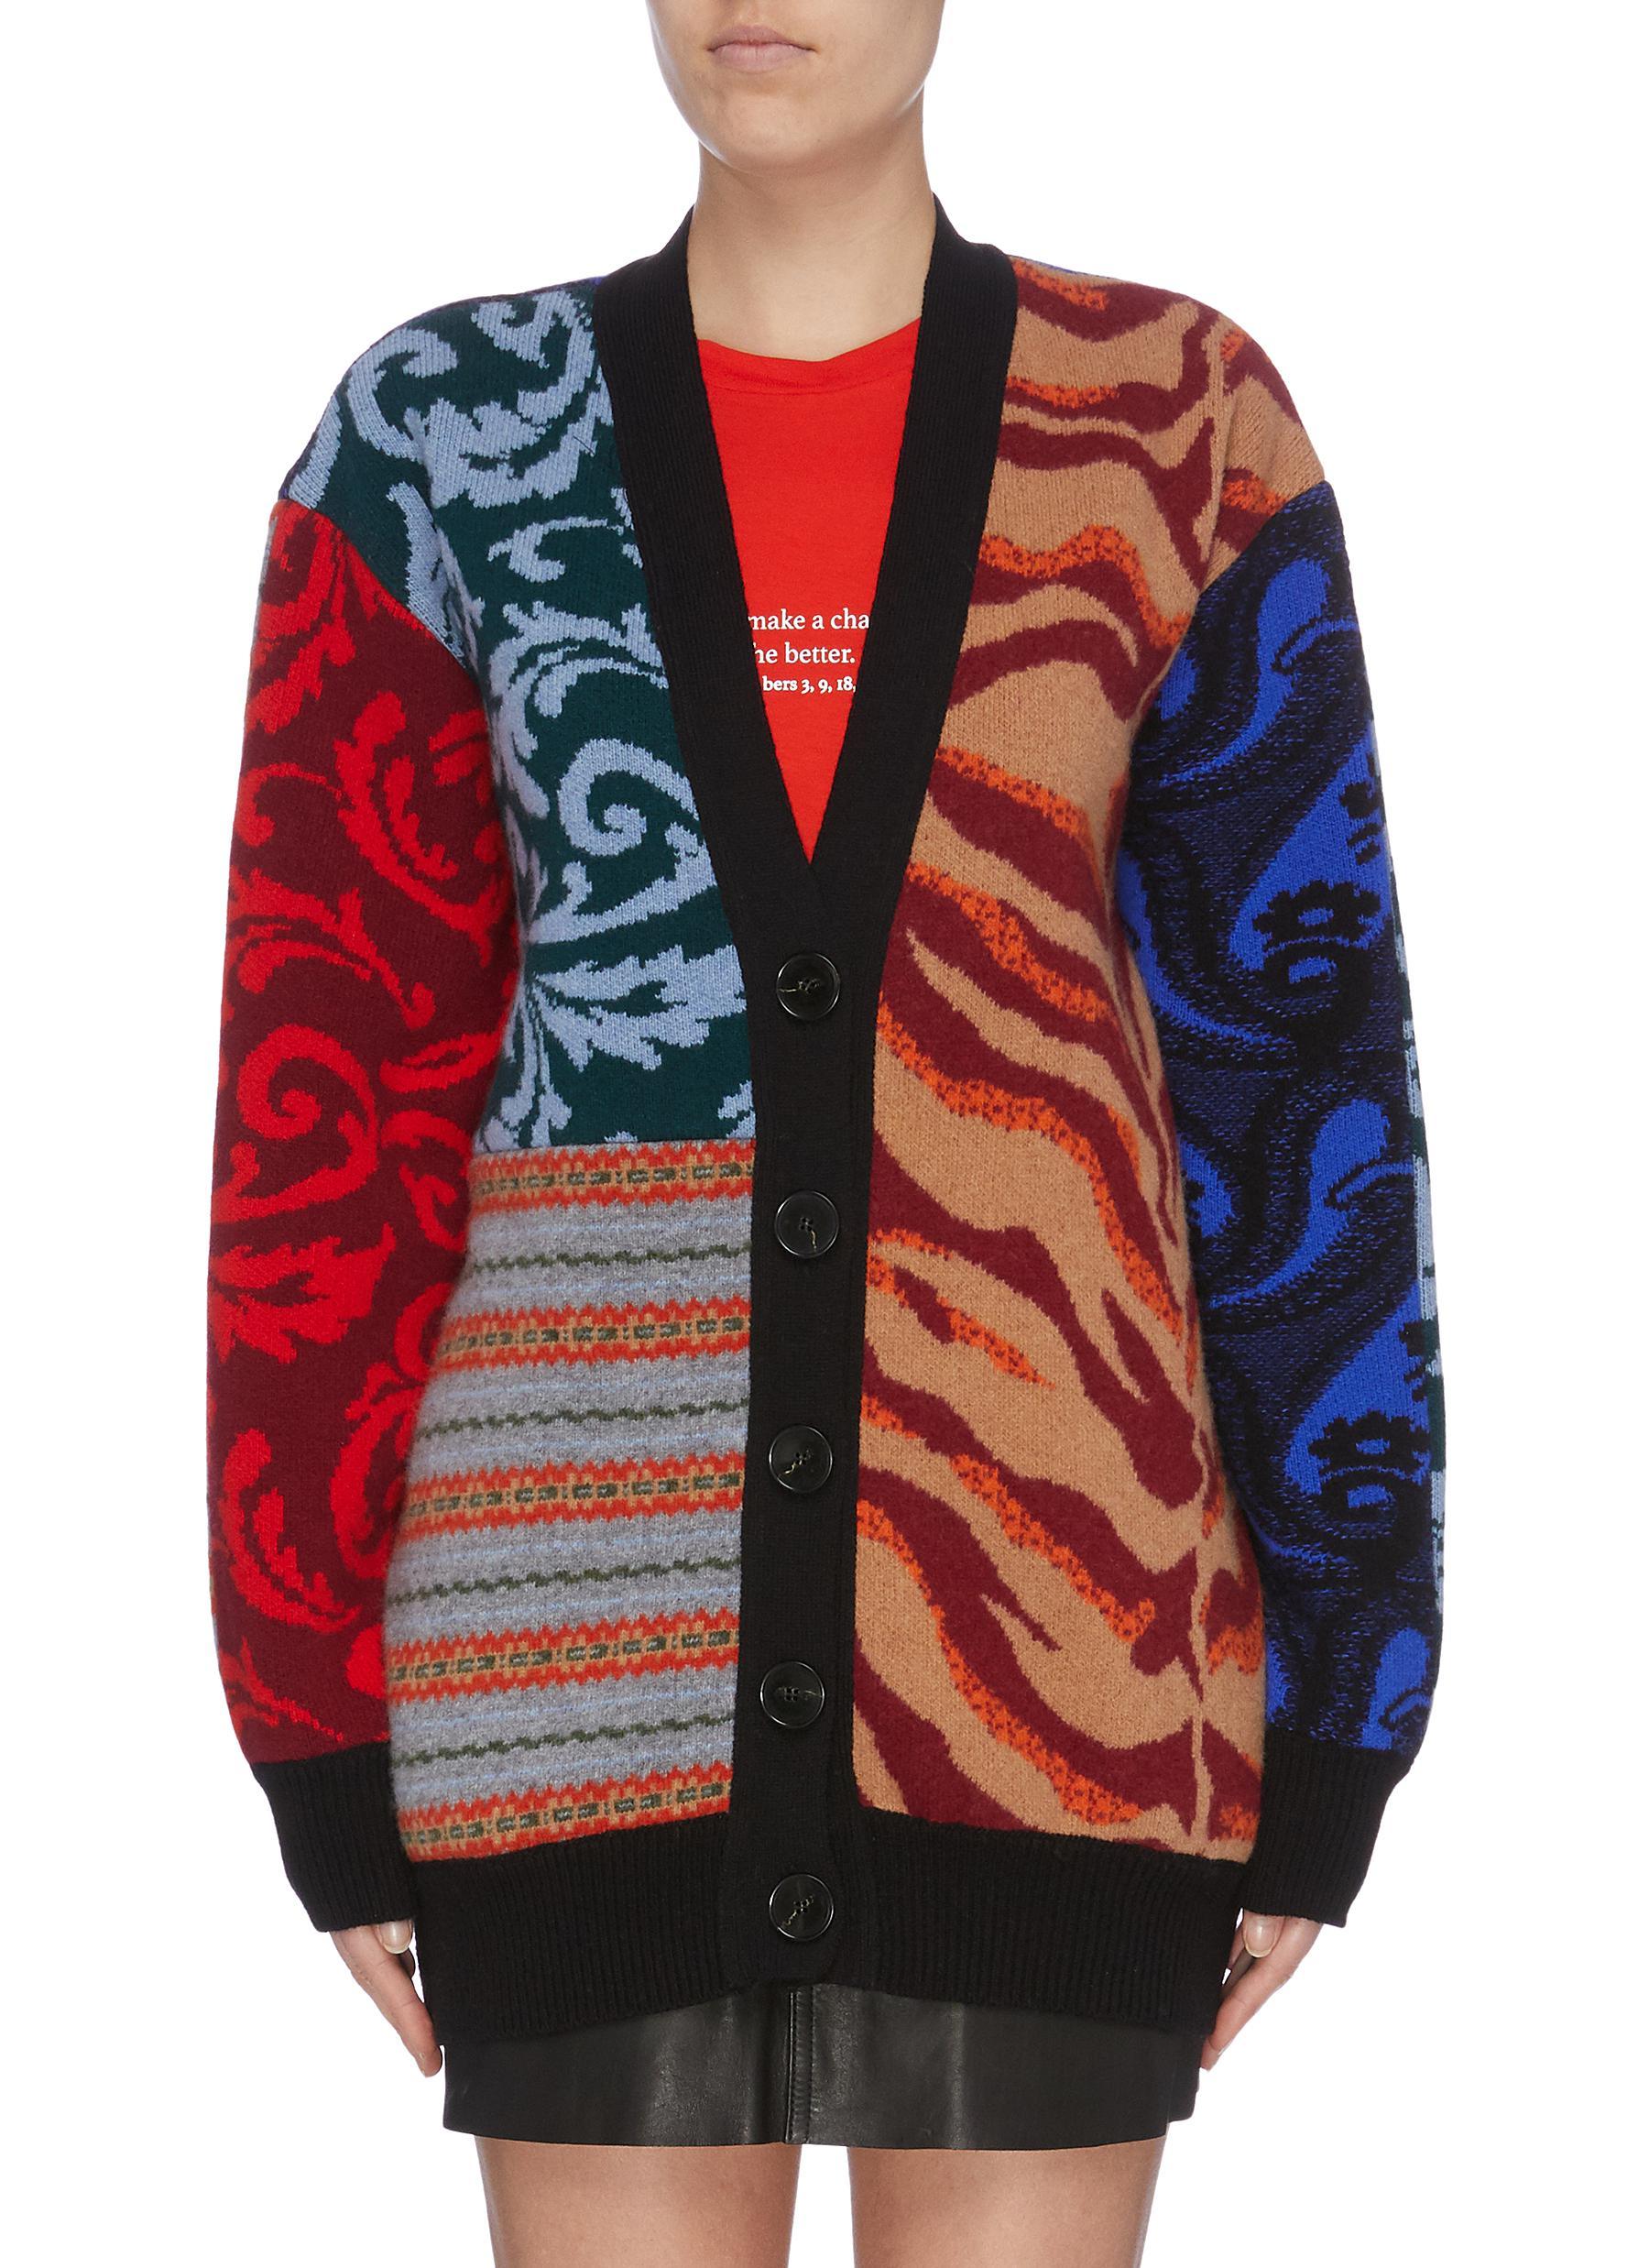 Mix jacquard patchwork cardigan by Stella Mccartney